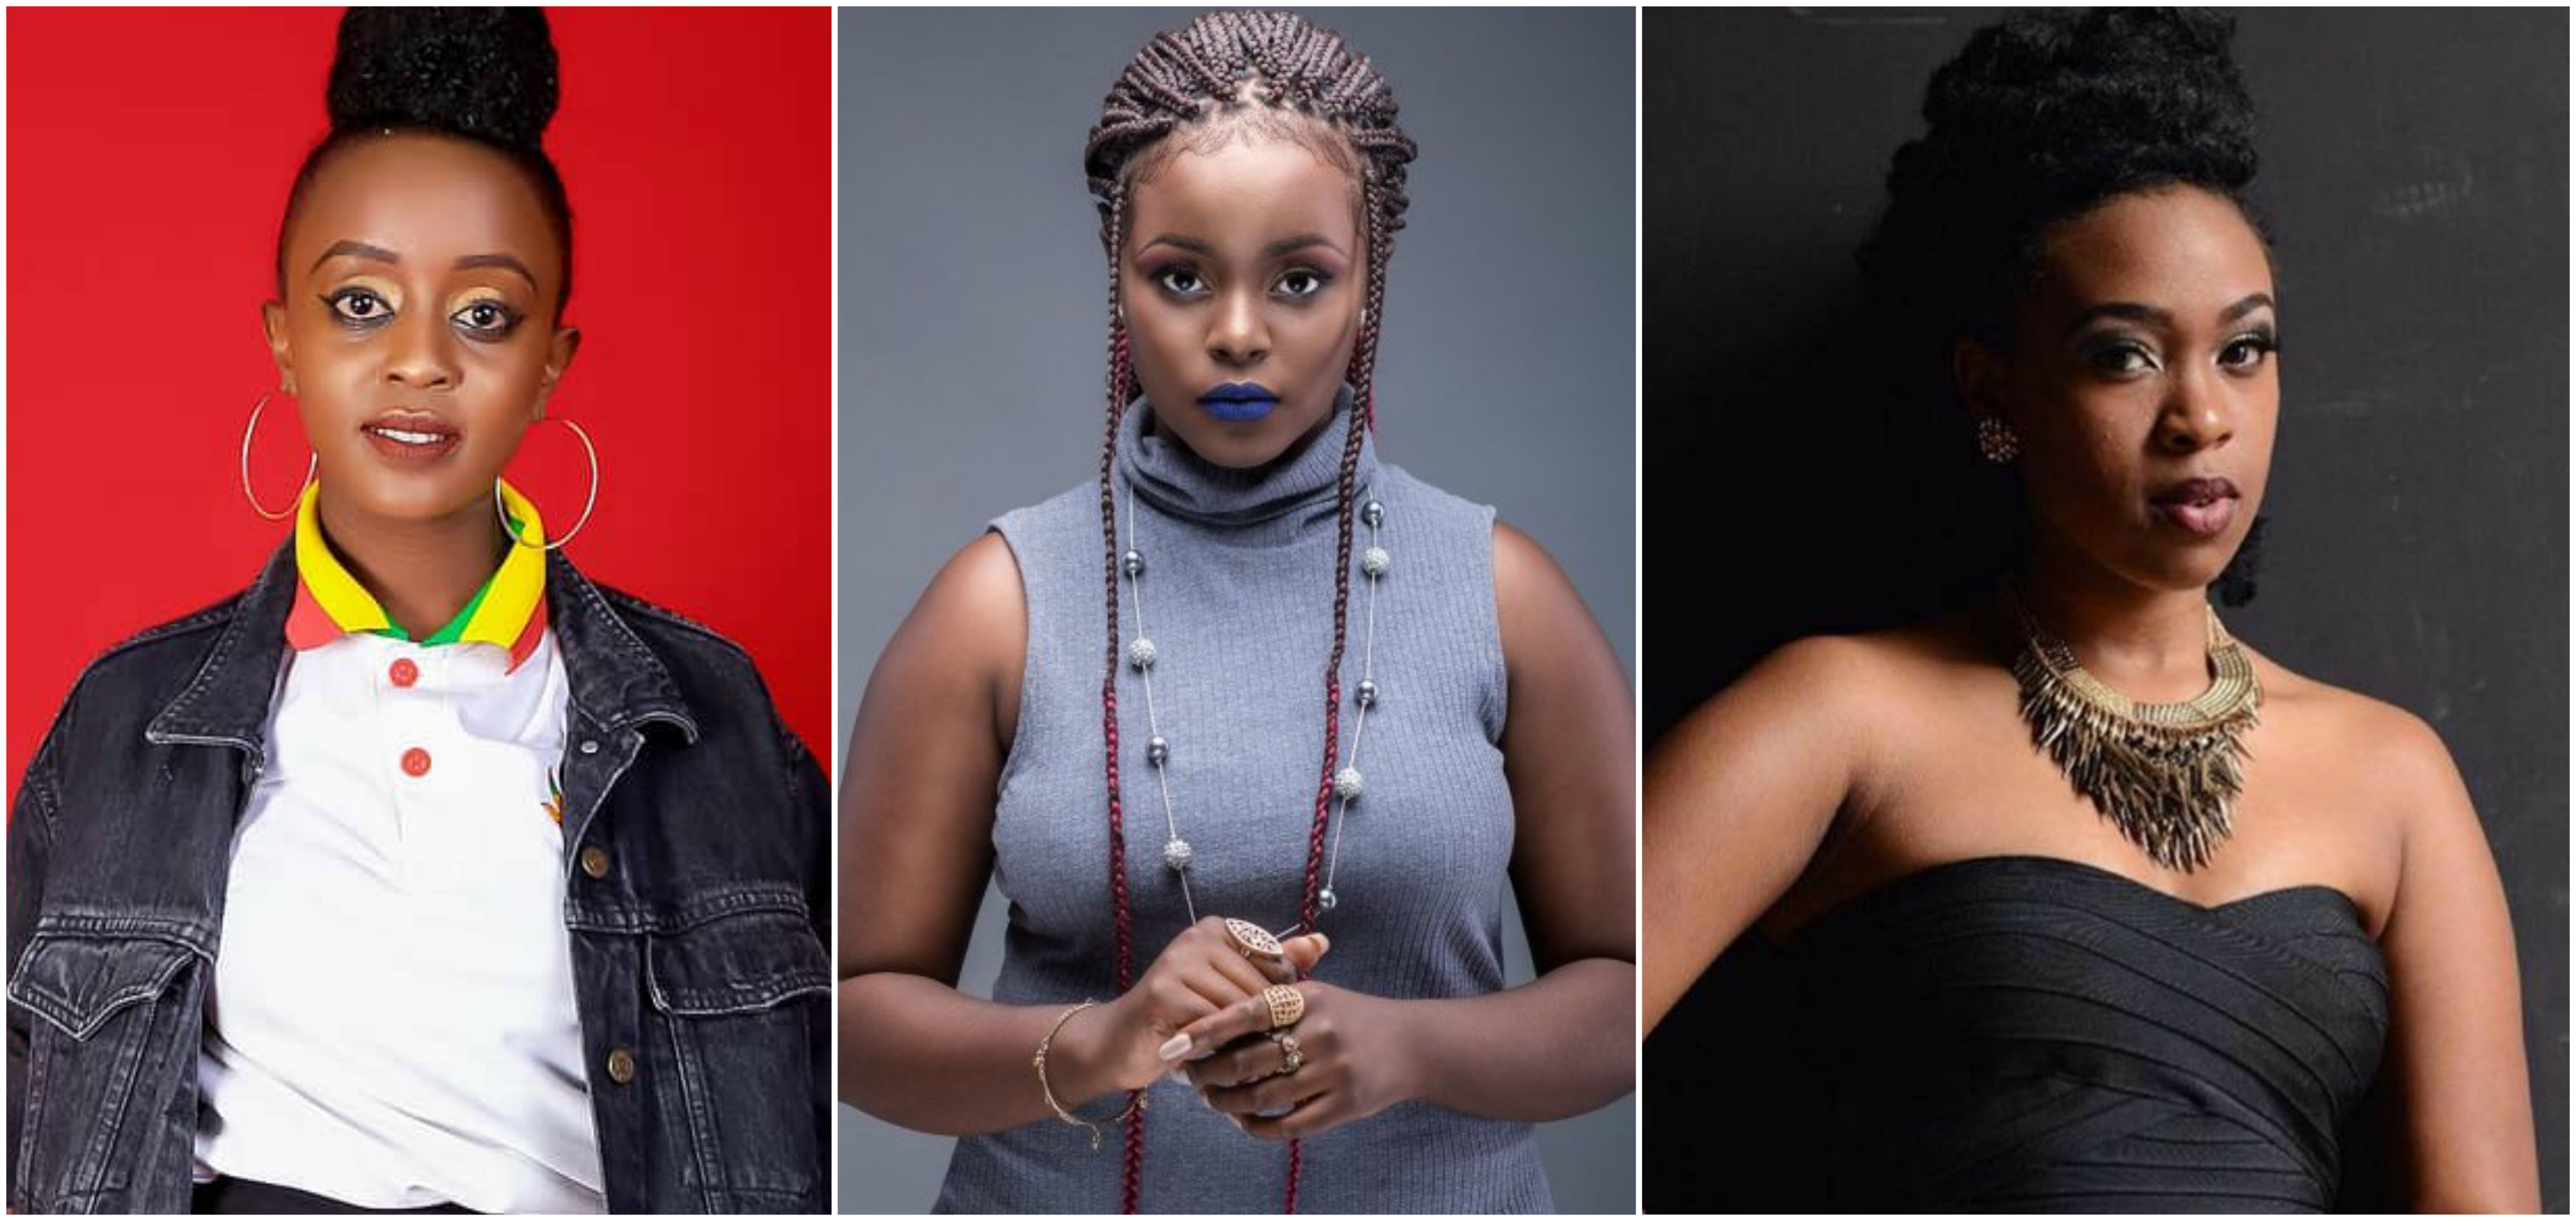 Nadia Mukami Vs Bridget Blue Vs Trina Mungai: Who is the best new female artist?